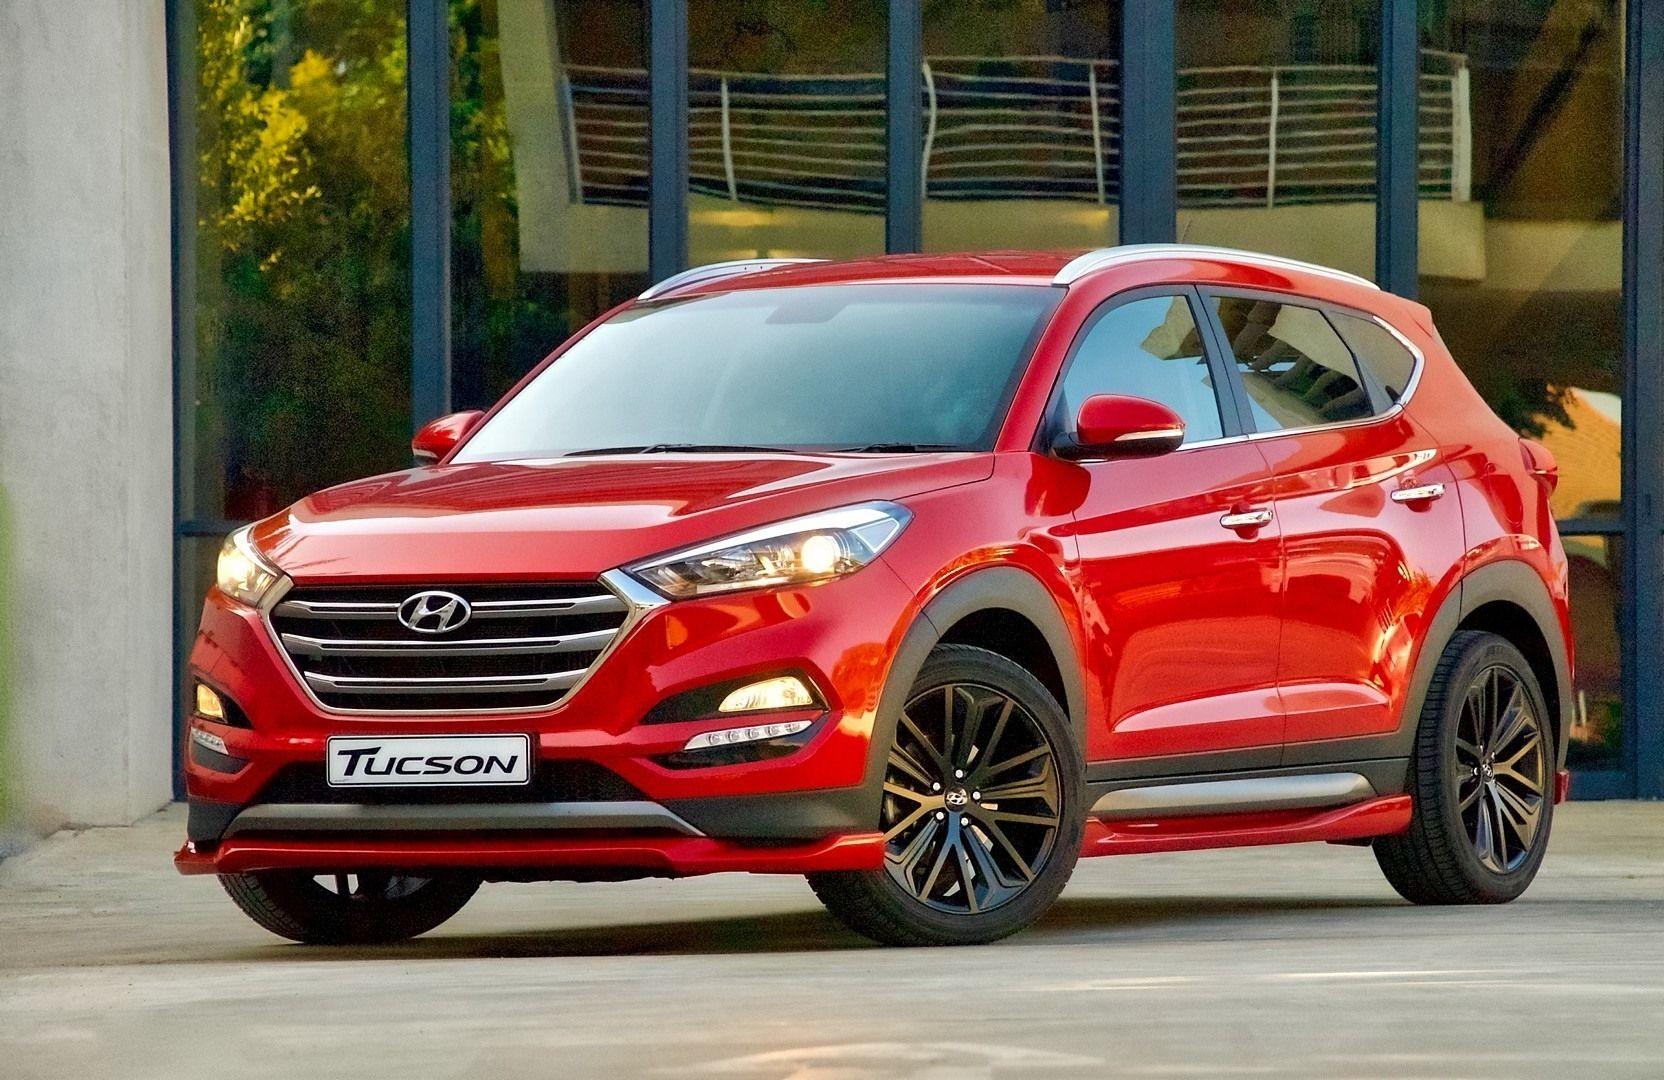 2018 Hyundai Tucson Specs And Review Hyundai Tucson Tucson Car Tucson